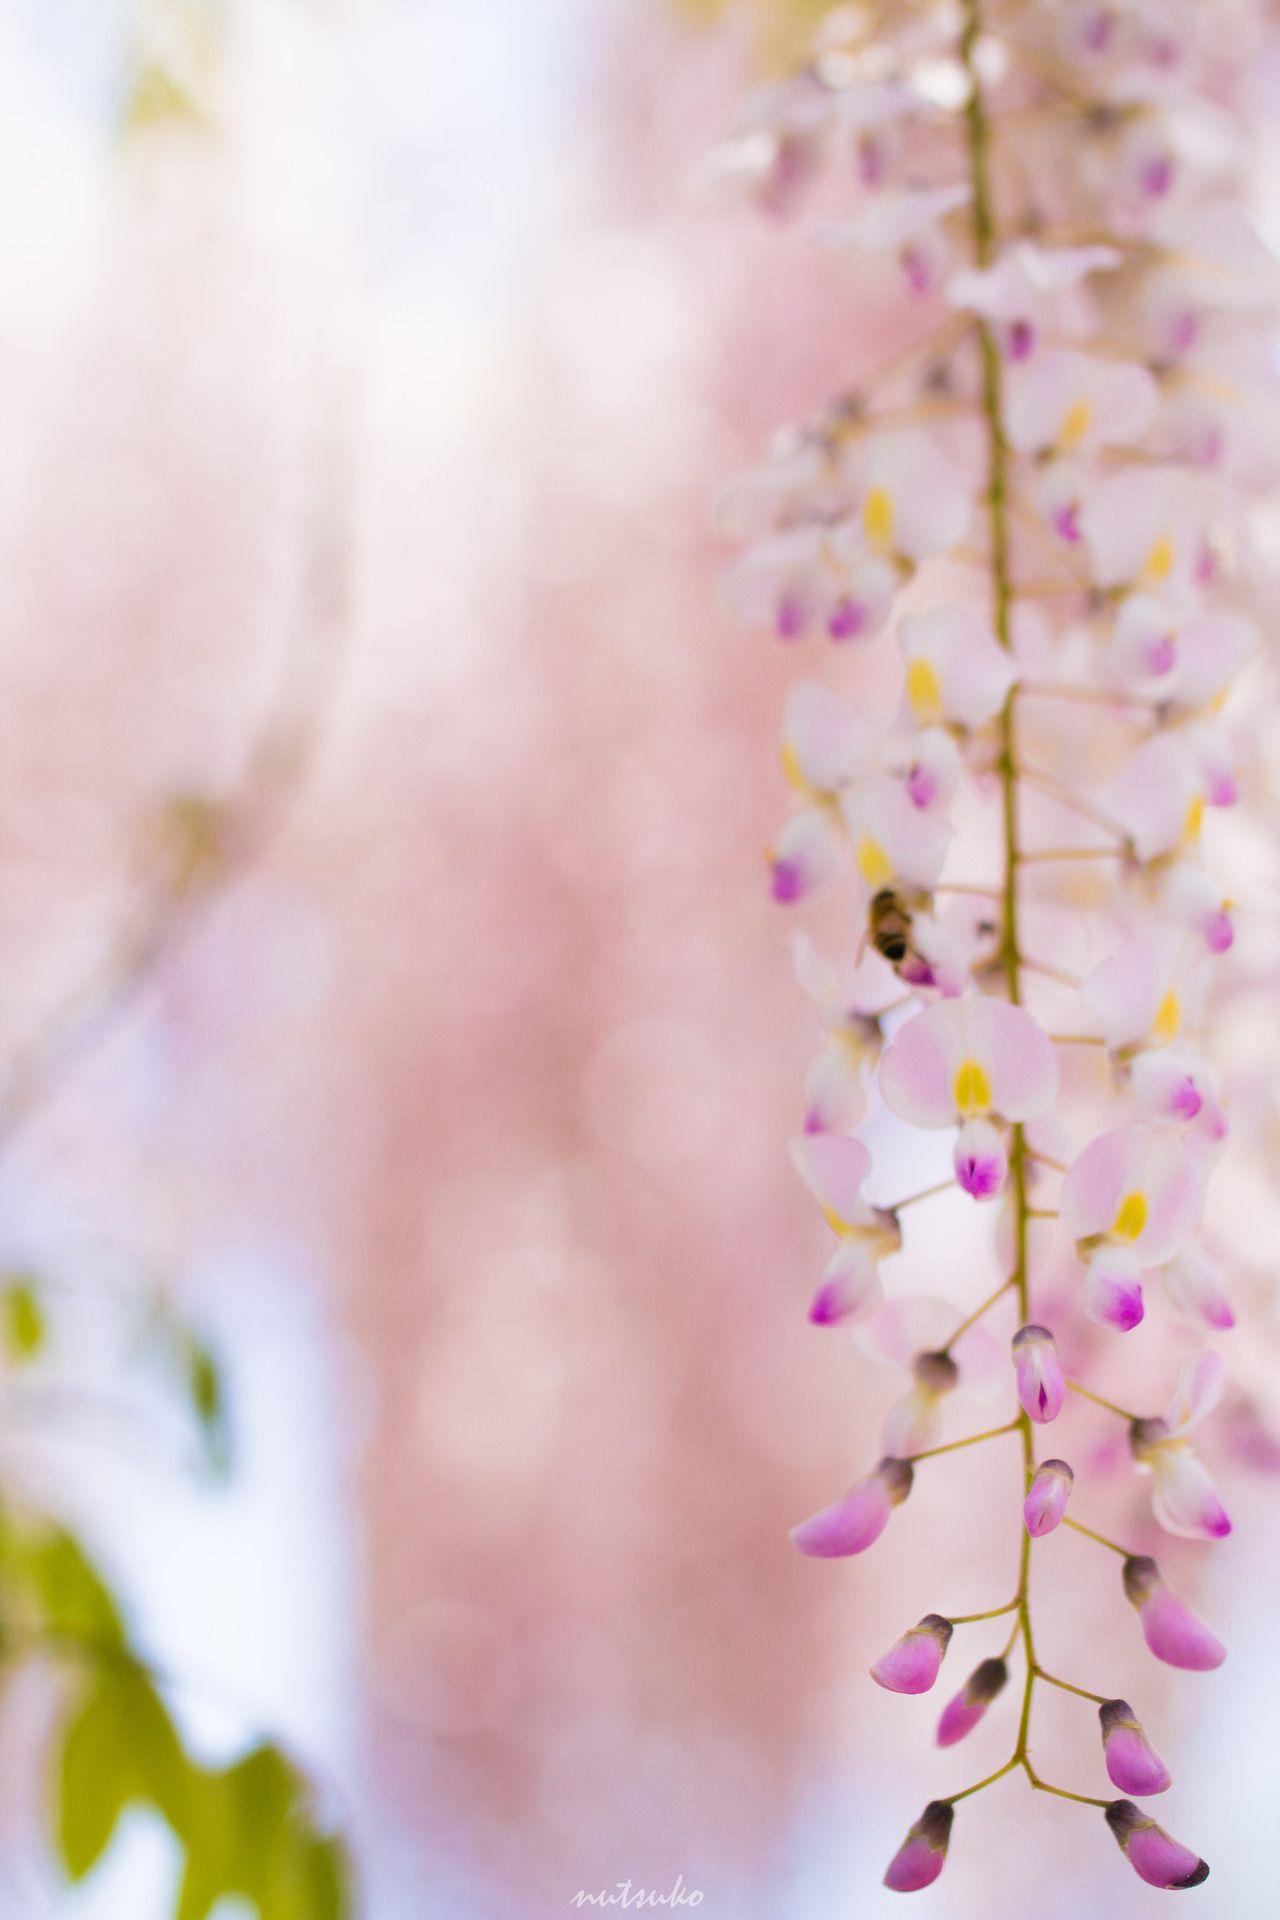 MACROPHOTOGRAPHY WISTERIA BEE